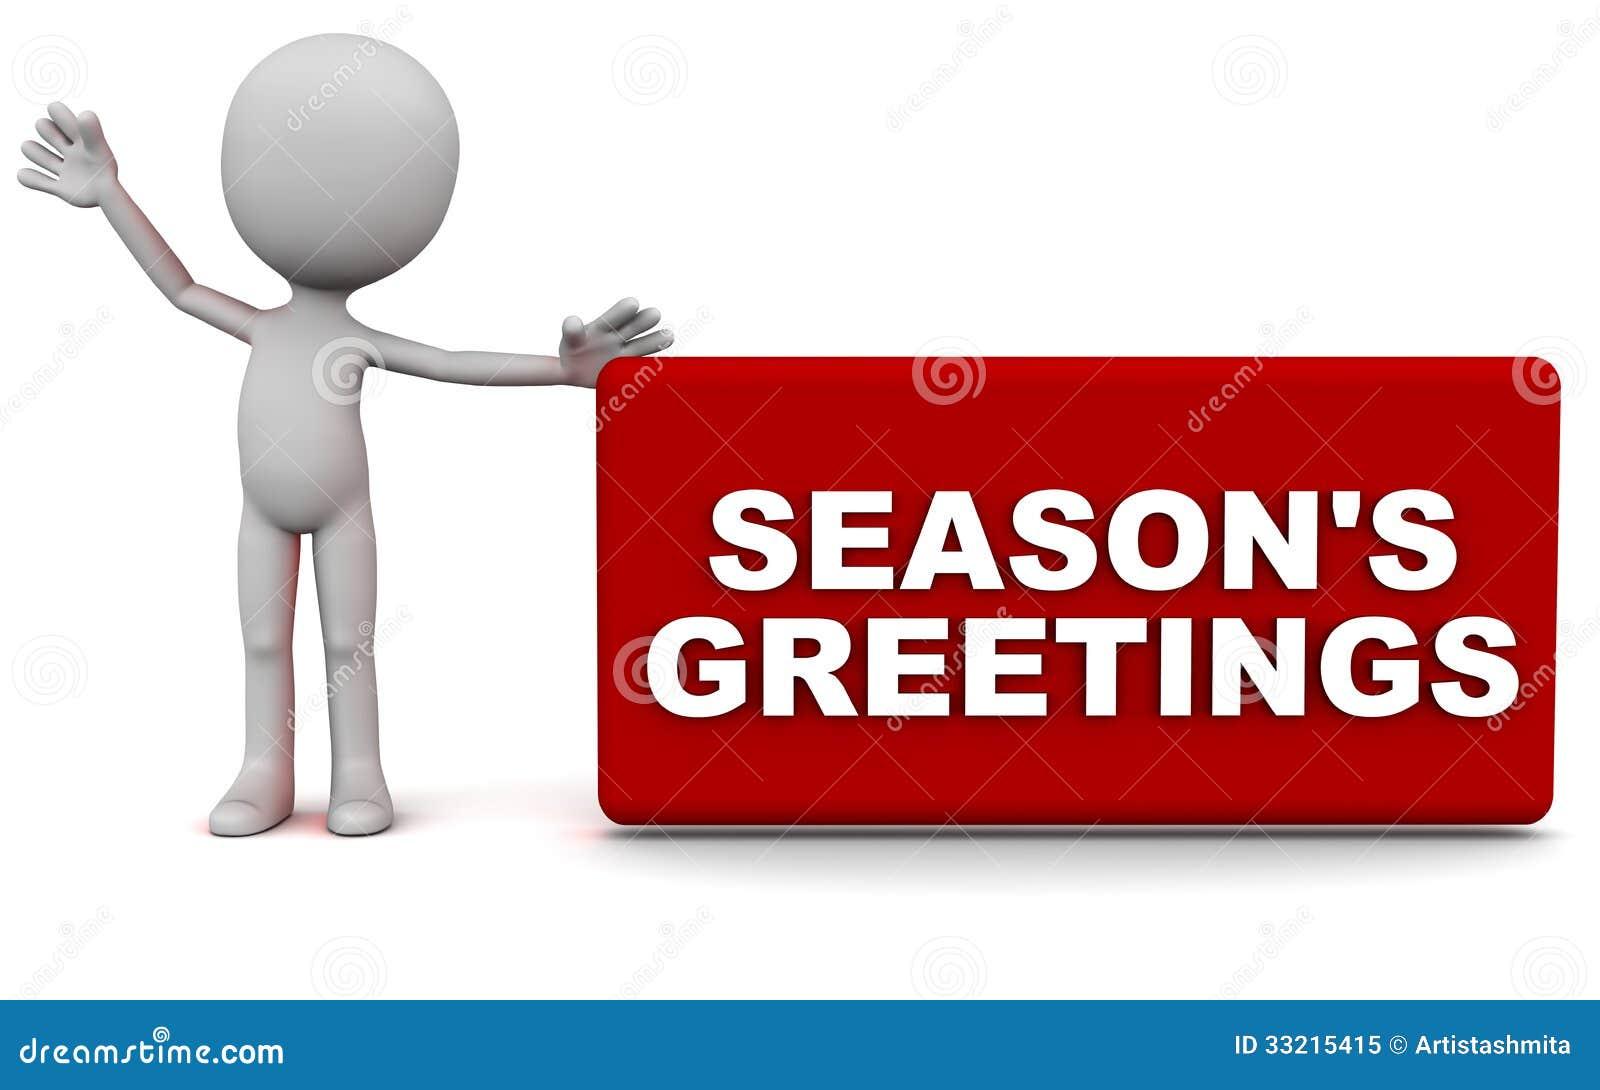 Seasons greetings stock illustration illustration of season seasons greetings kristyandbryce Choice Image